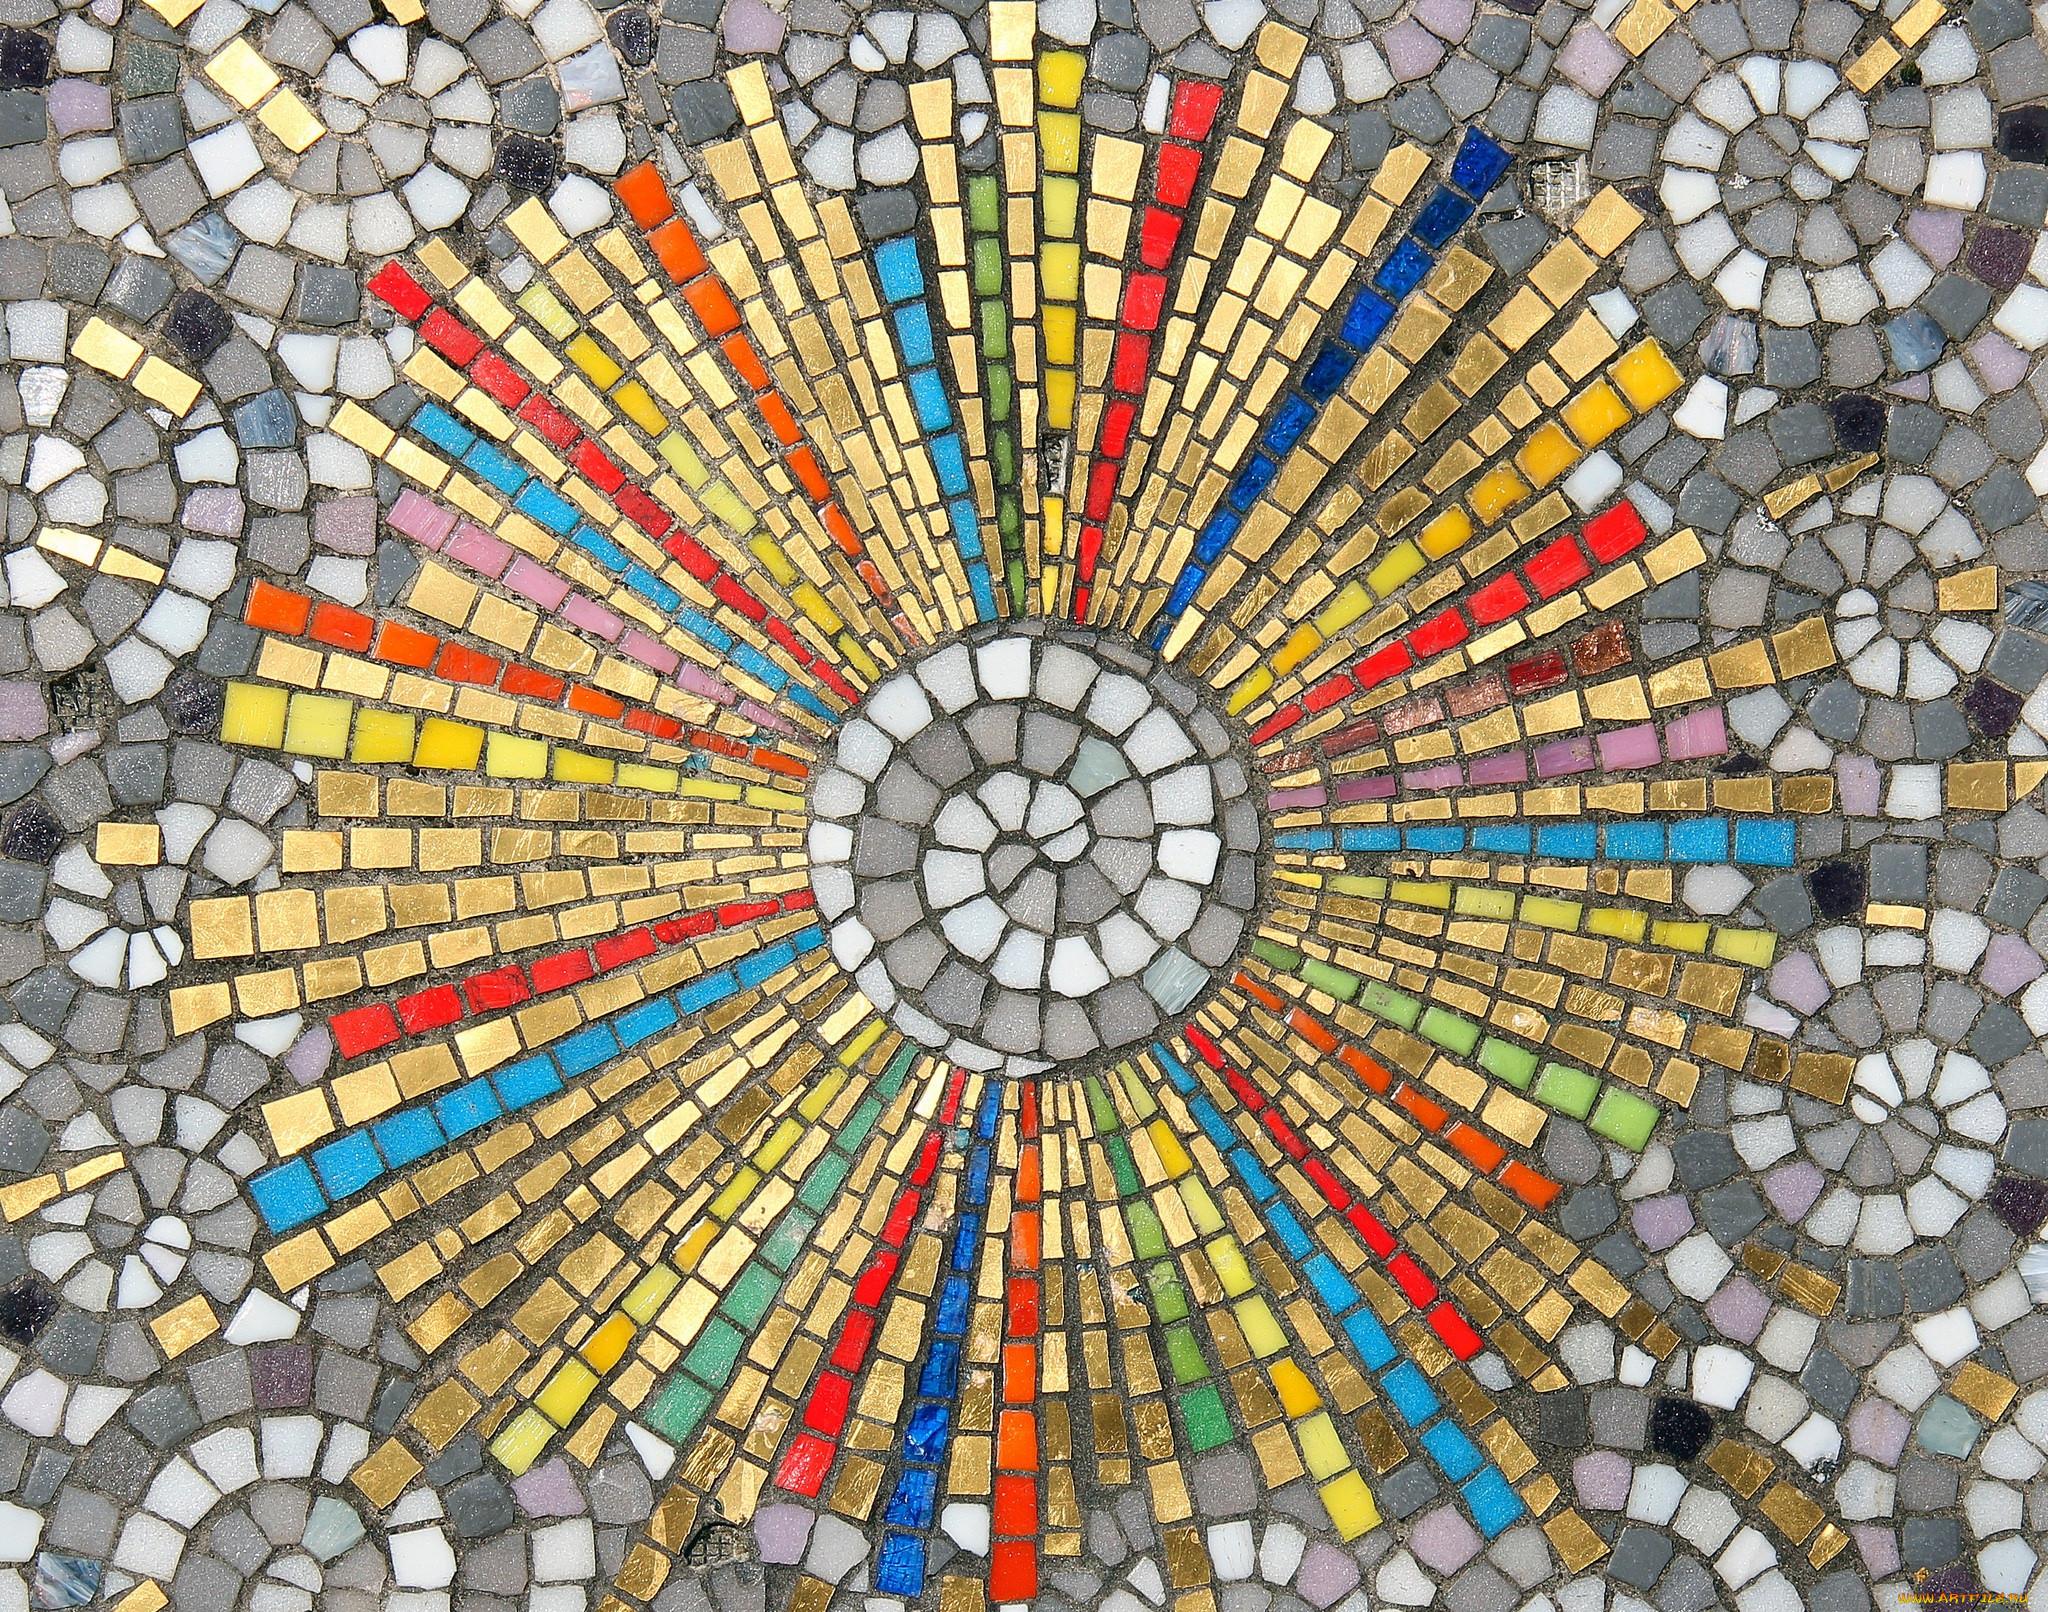 мозаика разная картинки далеко